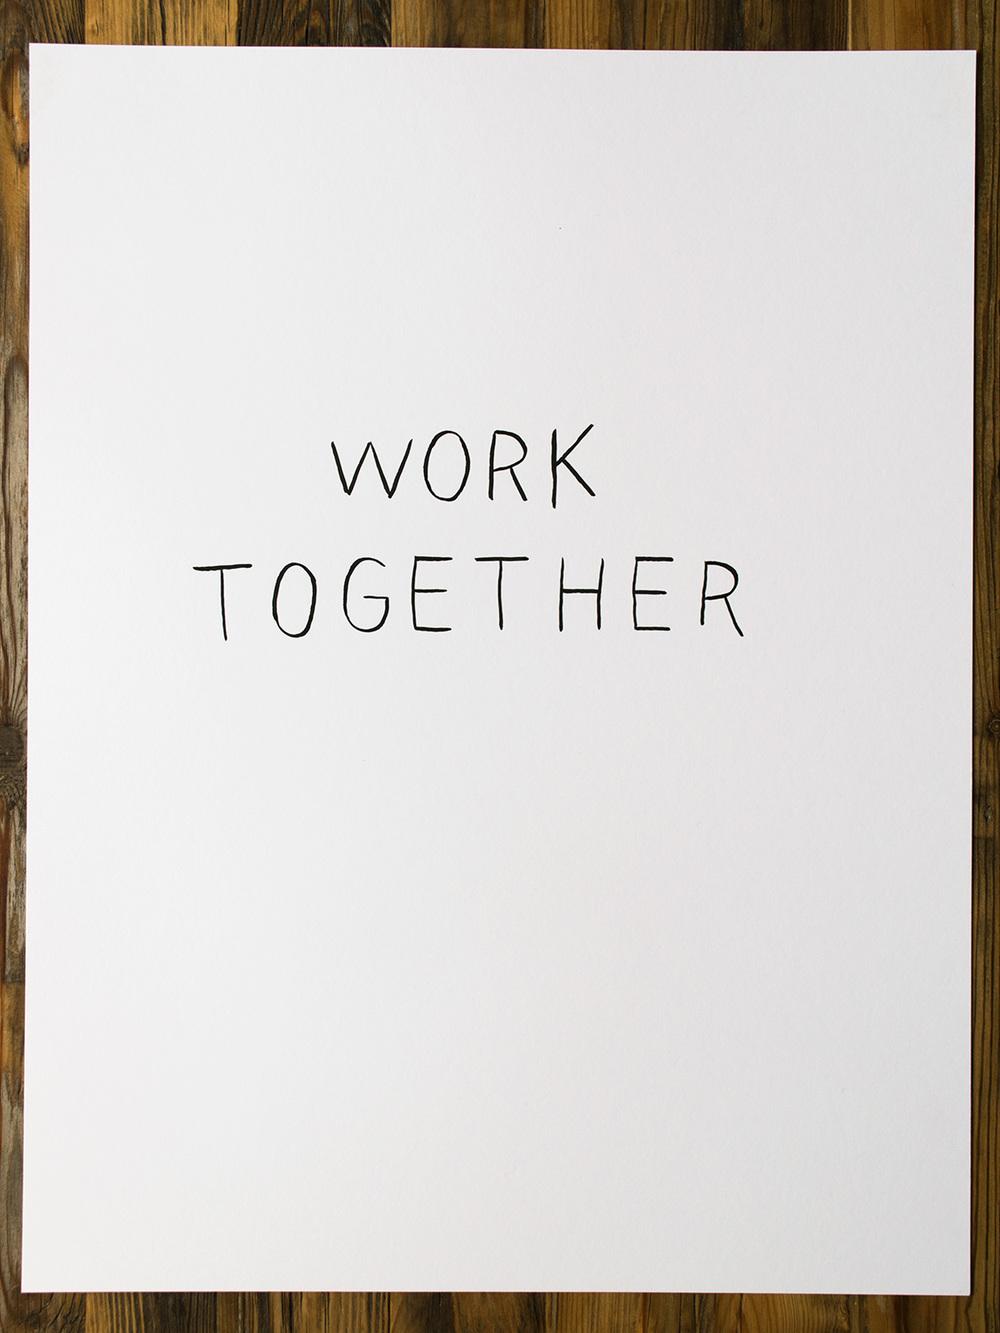 work_together-1500x1125.jpg